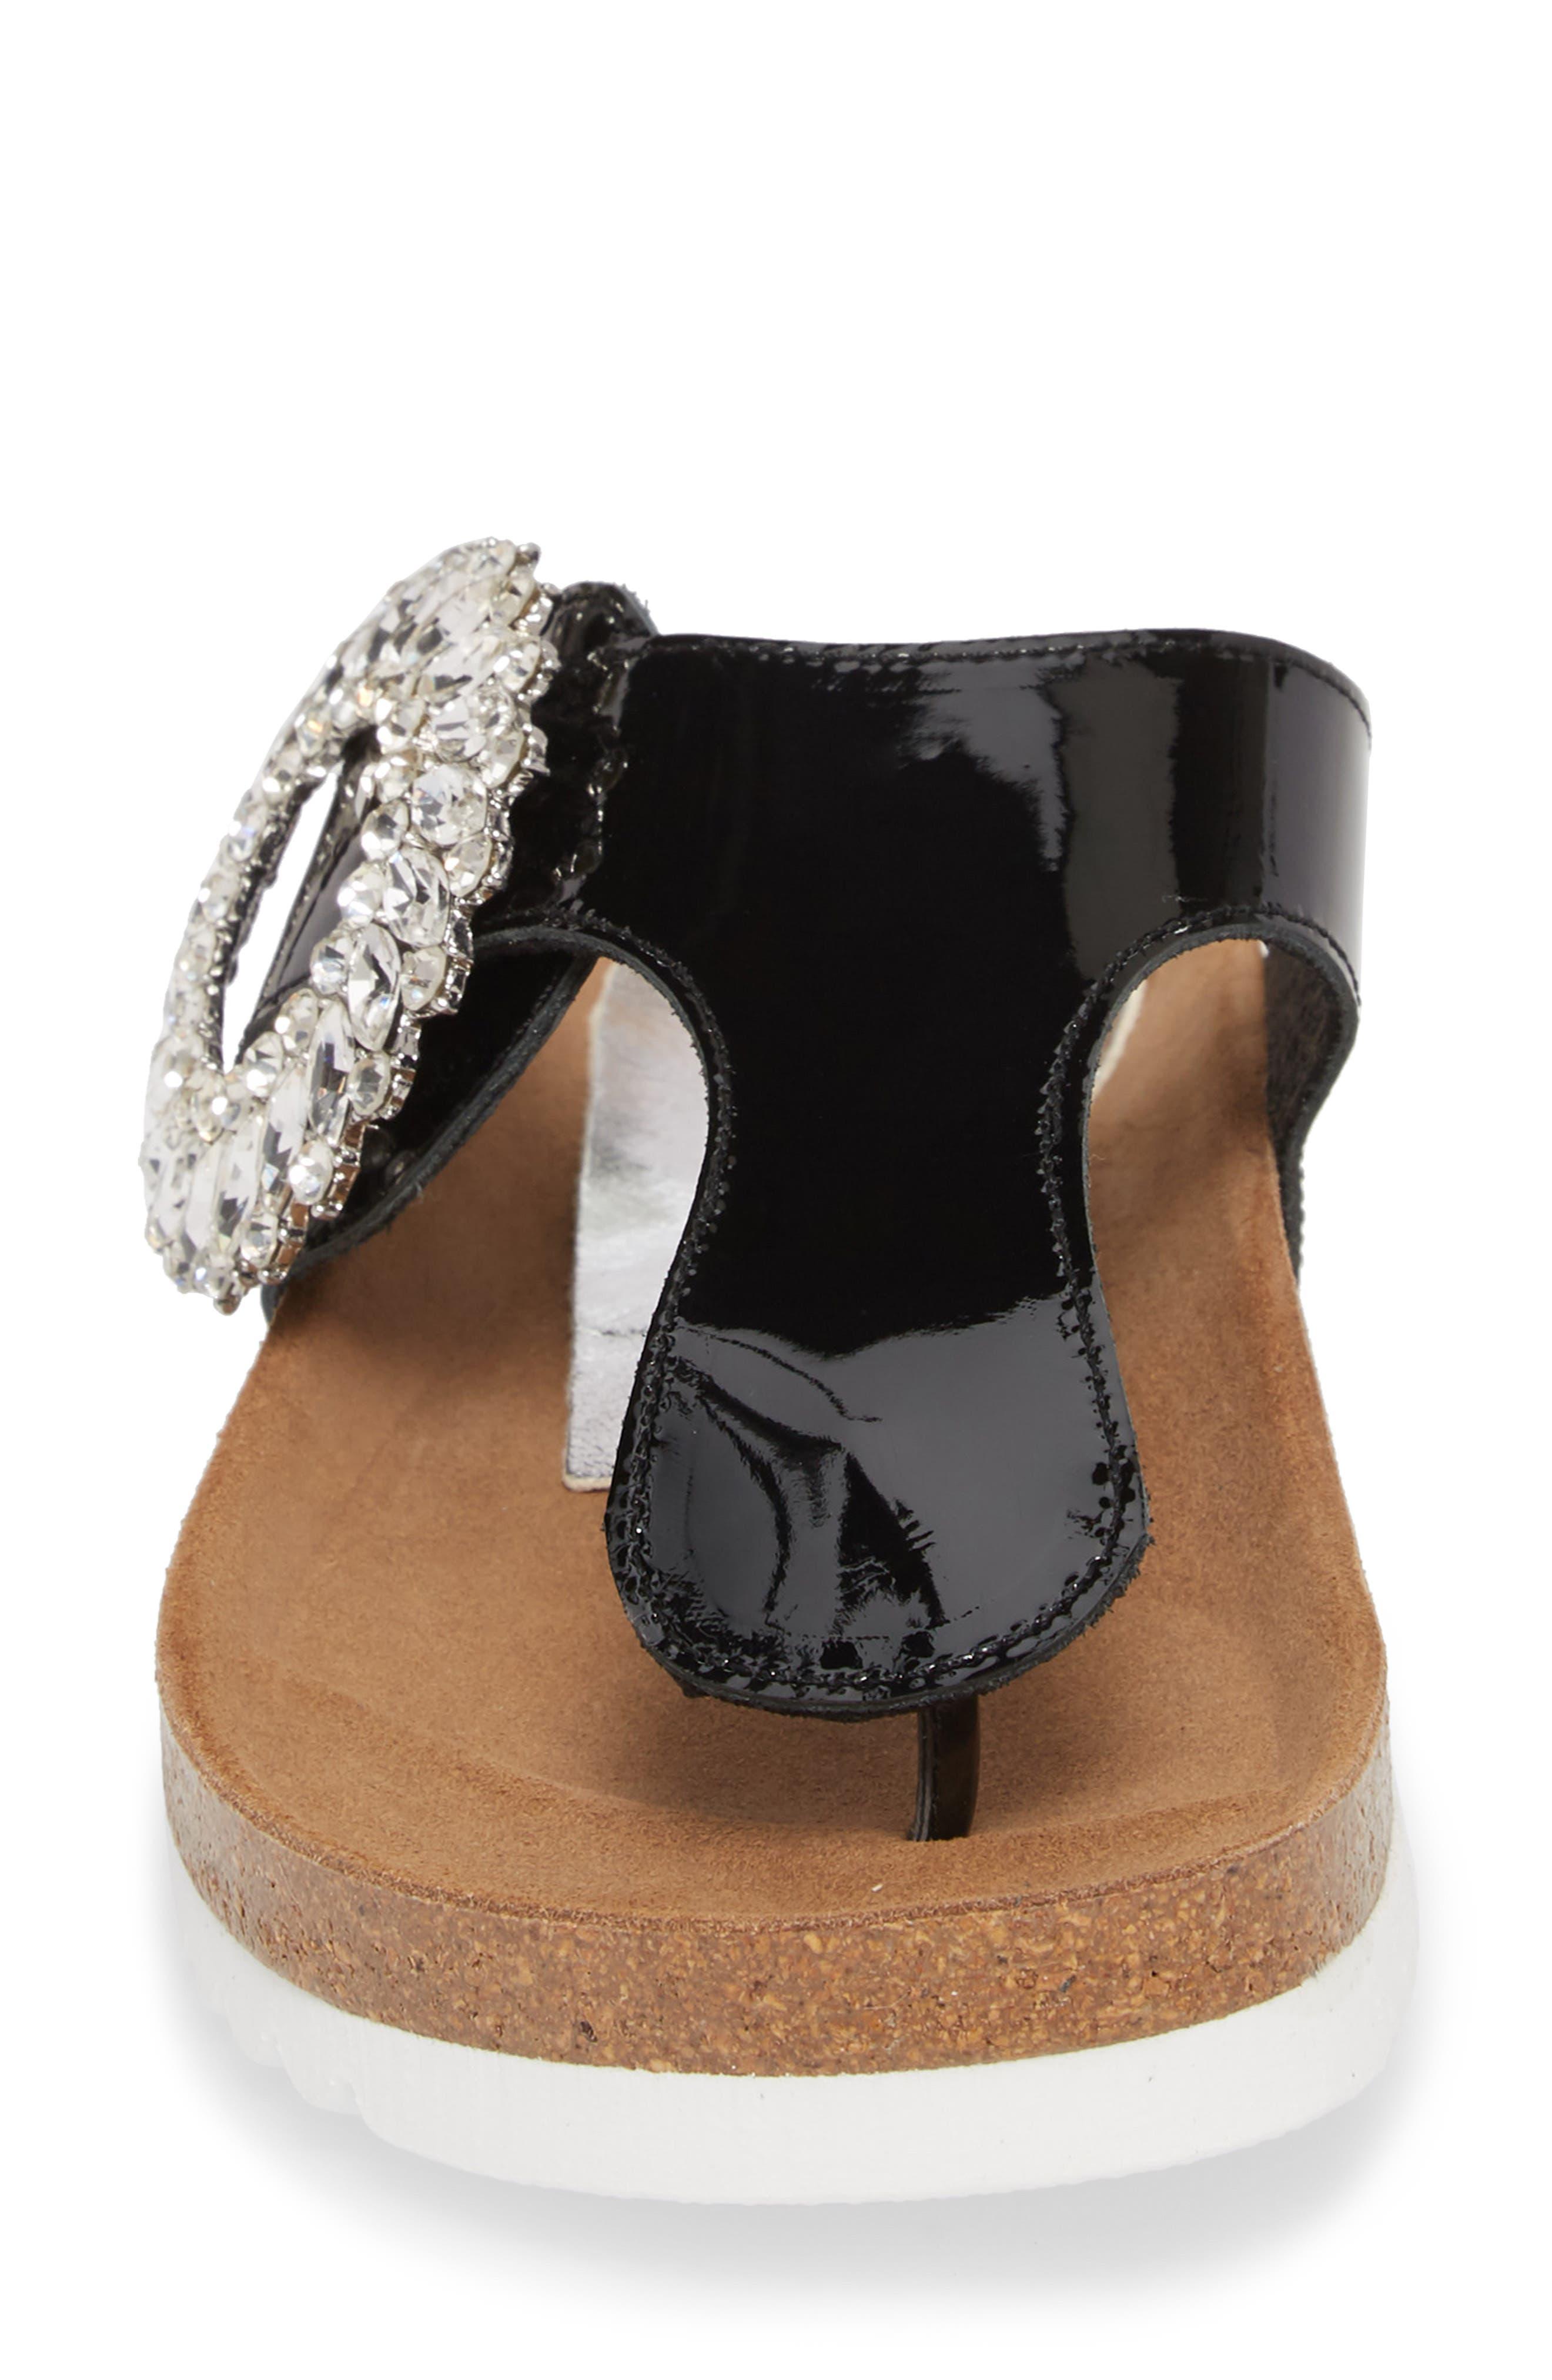 Madeira Embellished T-Strap Sandal,                             Alternate thumbnail 4, color,                             Black Patent/ Black Silver